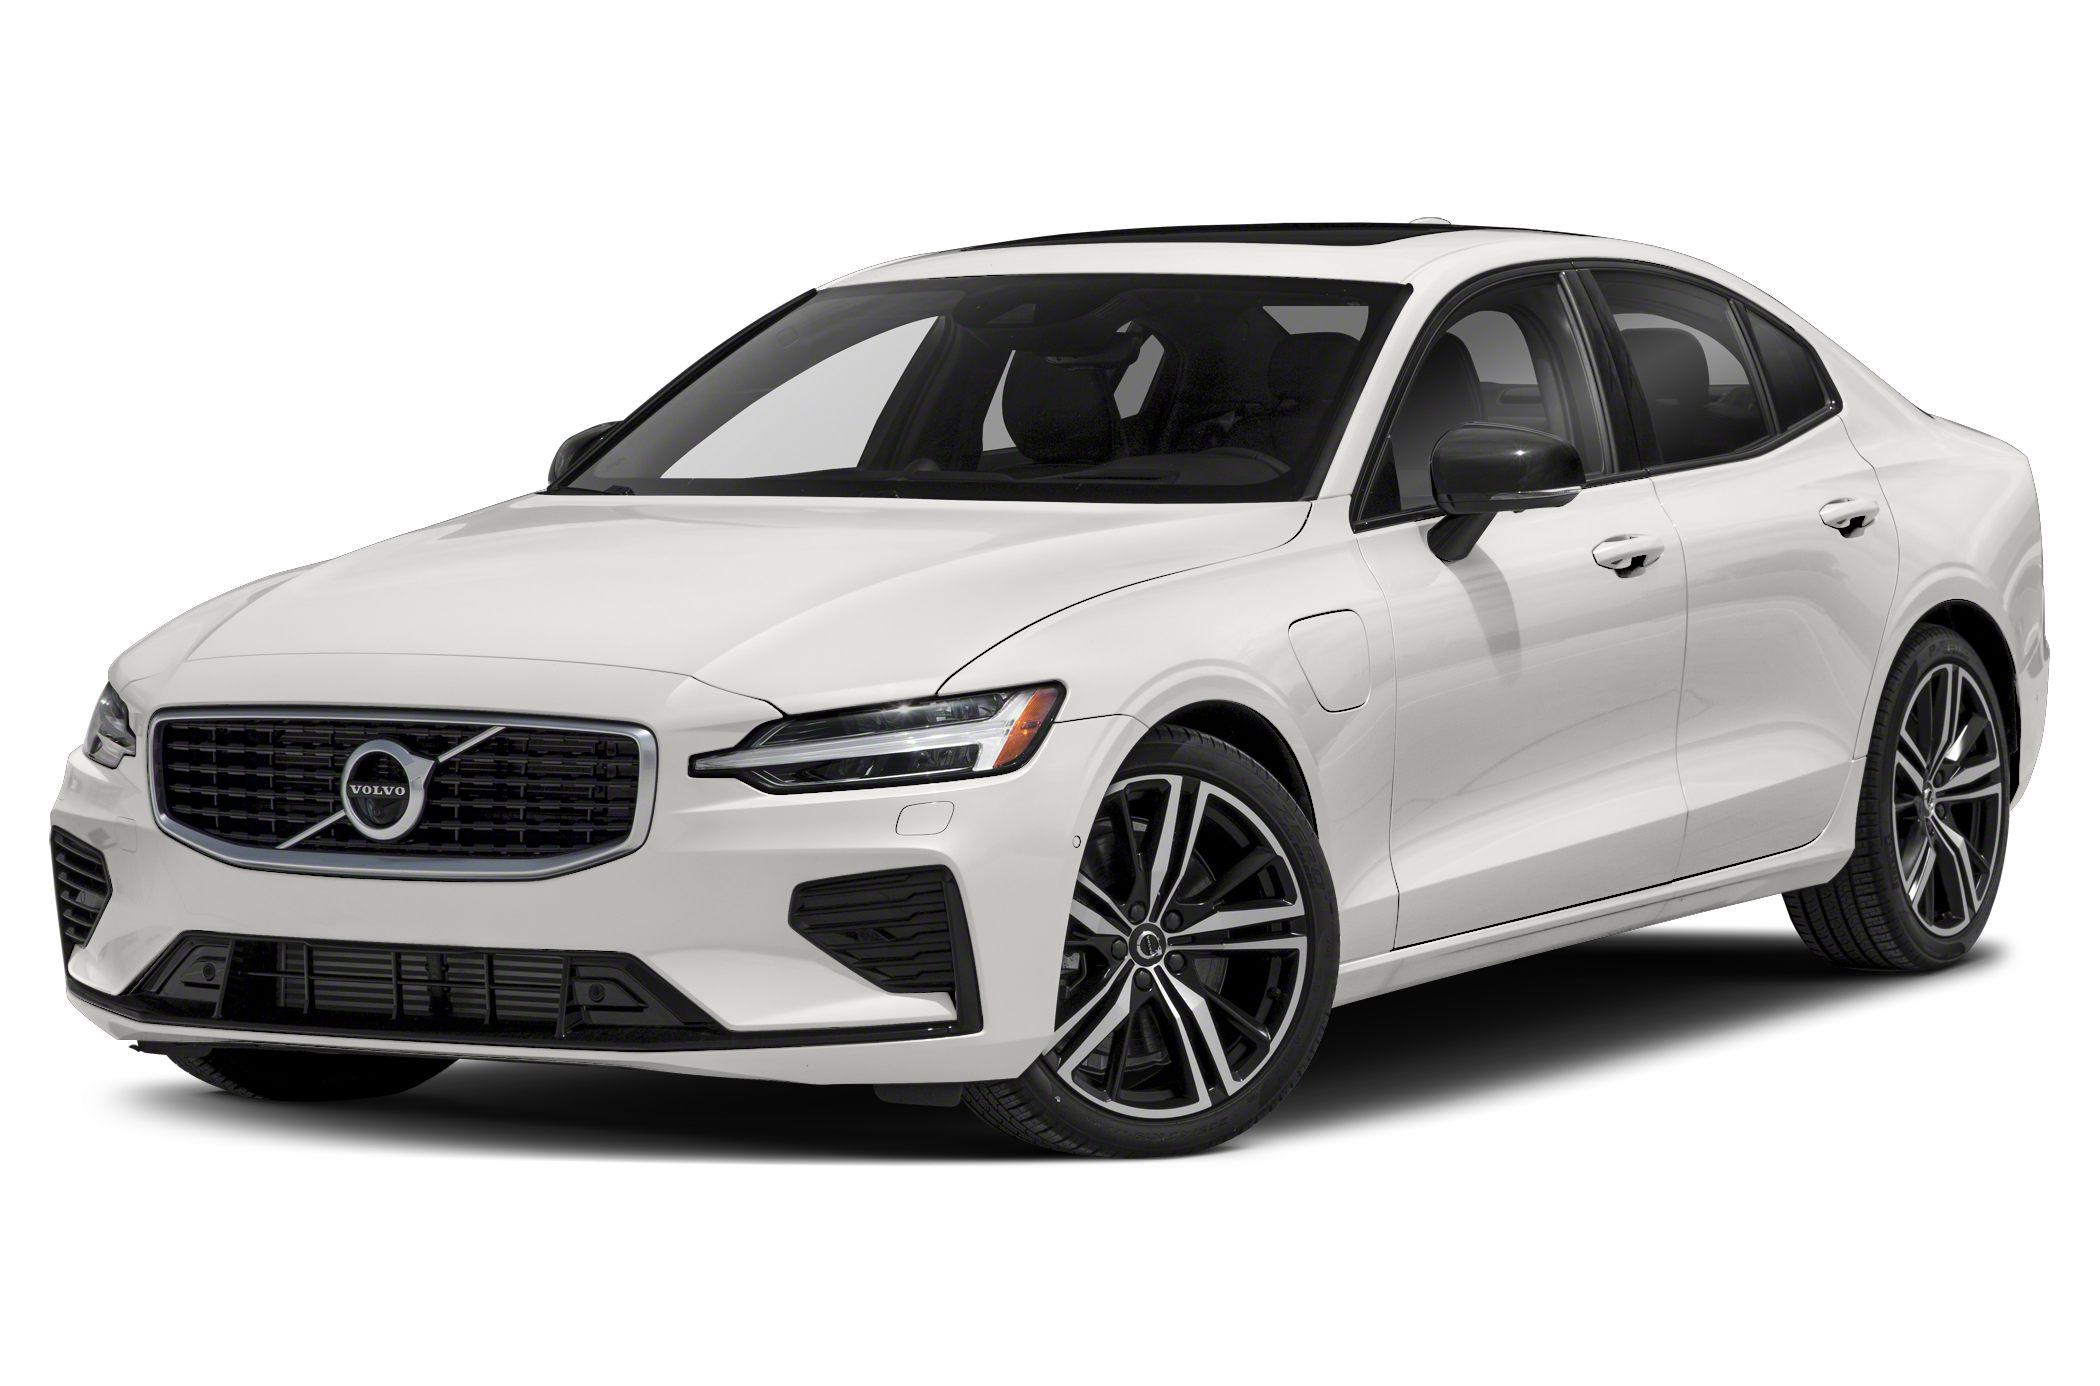 [Gewerbeleasing] Volvo S60 T8 Recharge AWD Geartronic Inscription 193 € p.M., LF 0,29 - nach Verrechnung BAFA Umweltbonus